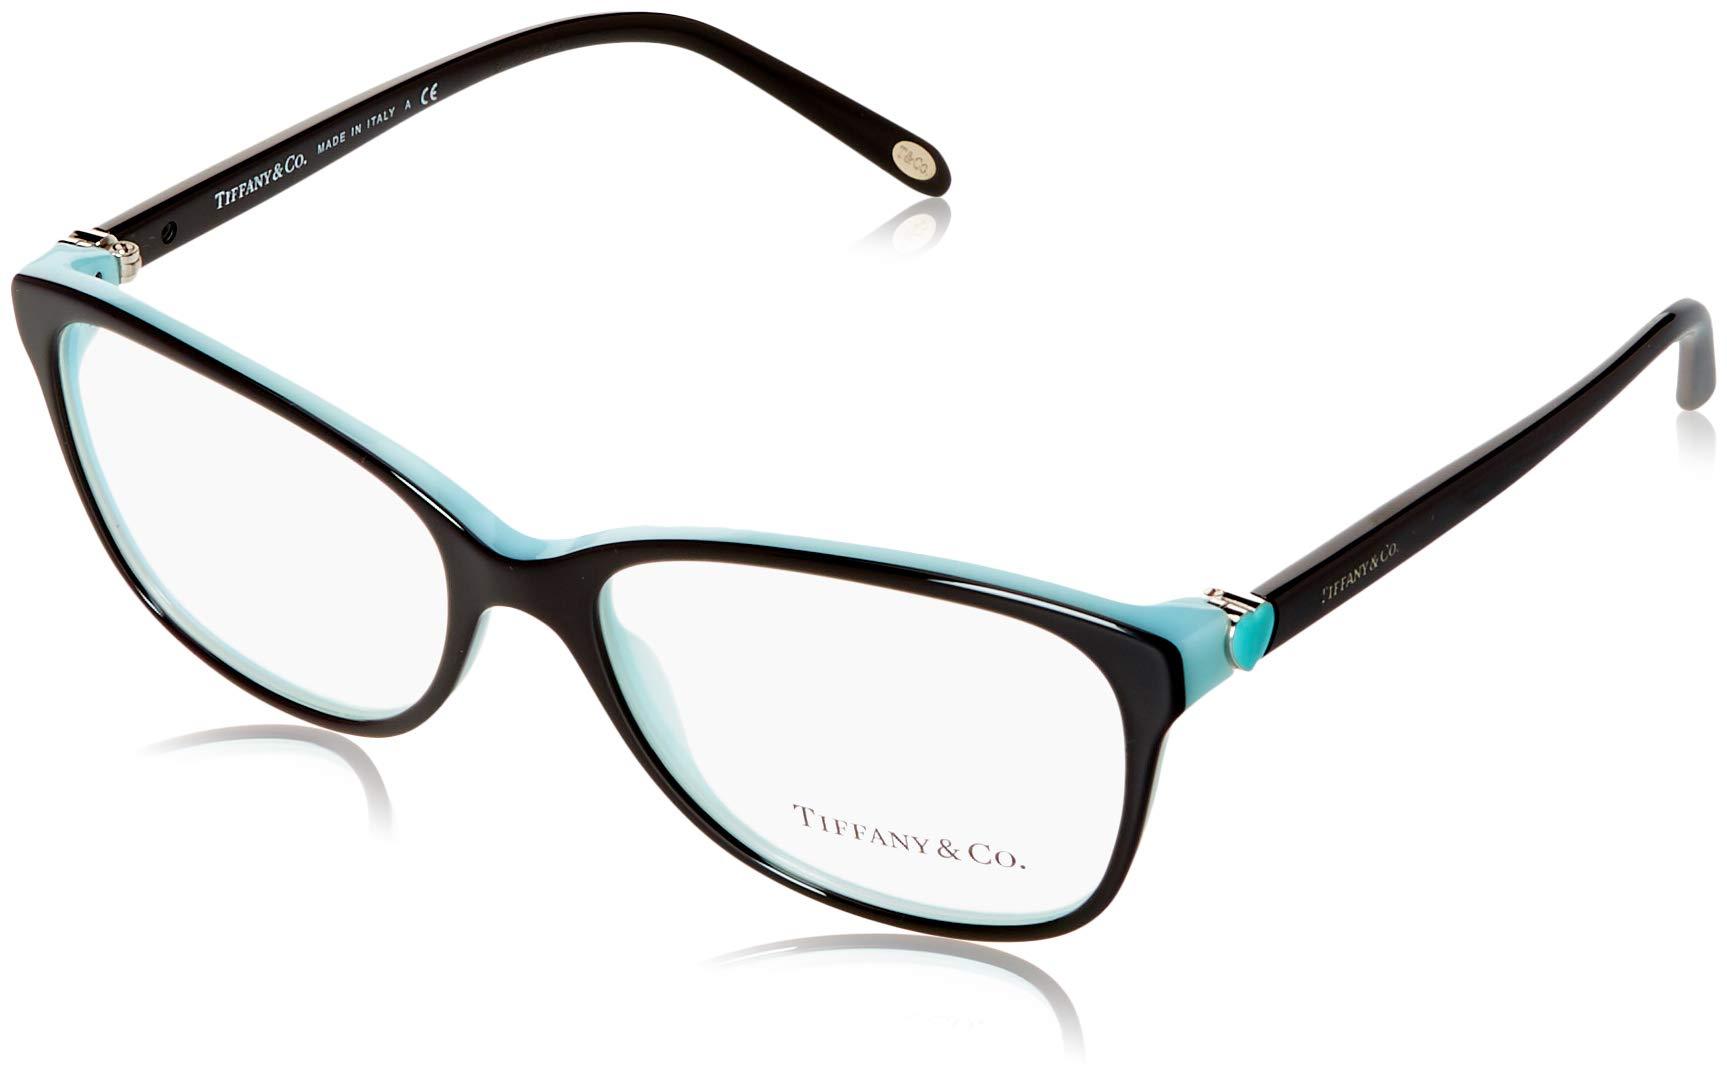 TIFFANY Eyeglasses TF 2097 8055 Black/Blue 52MM